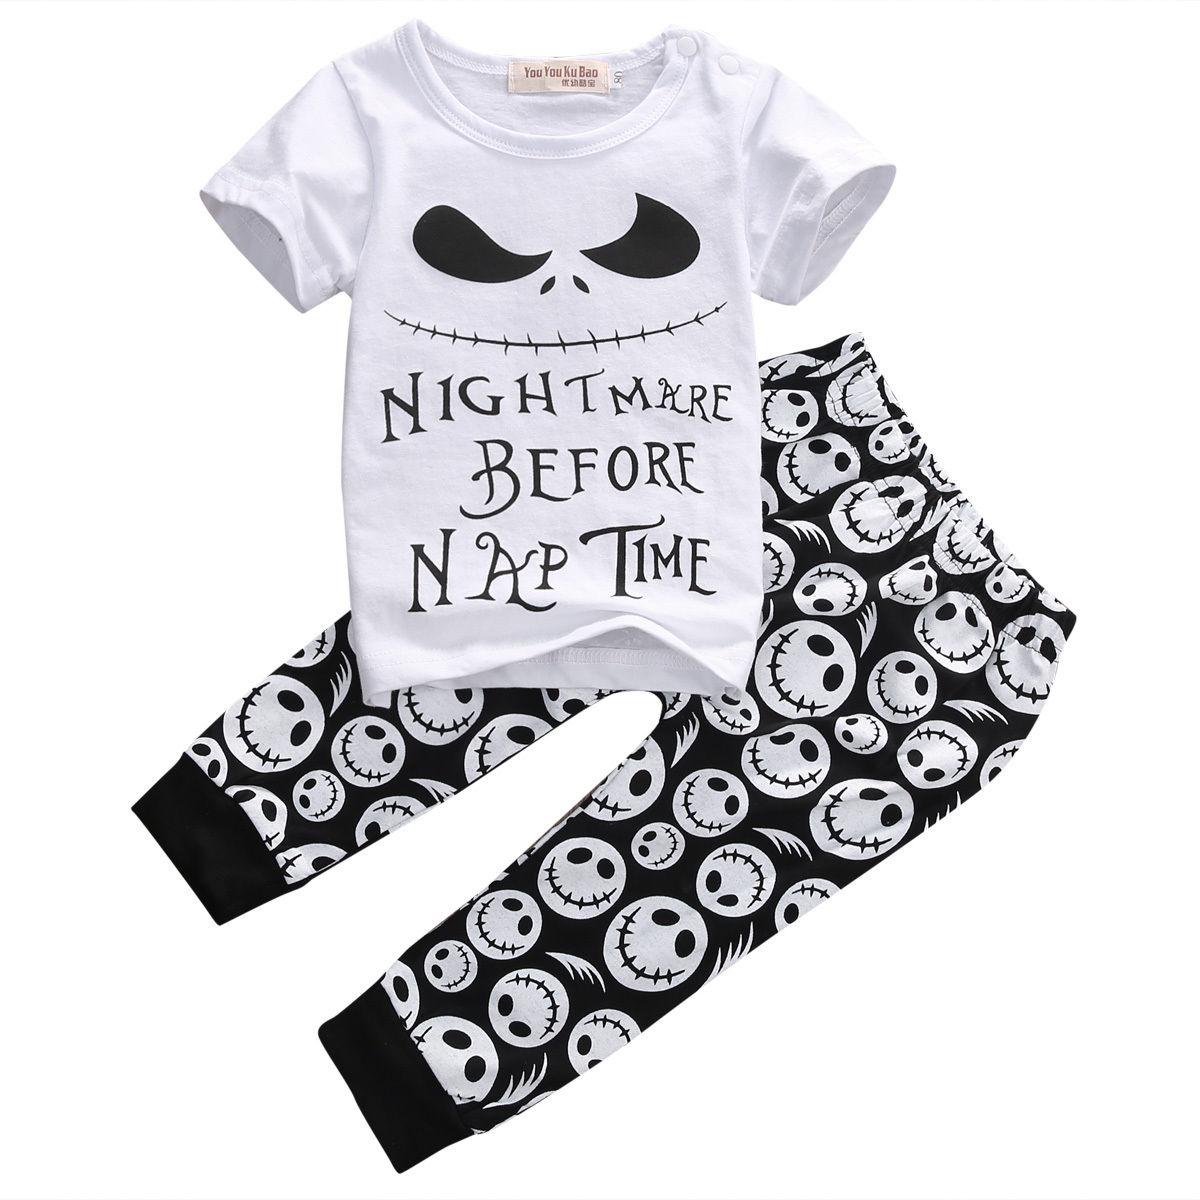 Toddler Kids Baby Girls Clothes Cotton T-shirt Tops+Shorts Pants 2PCS Outfit Set